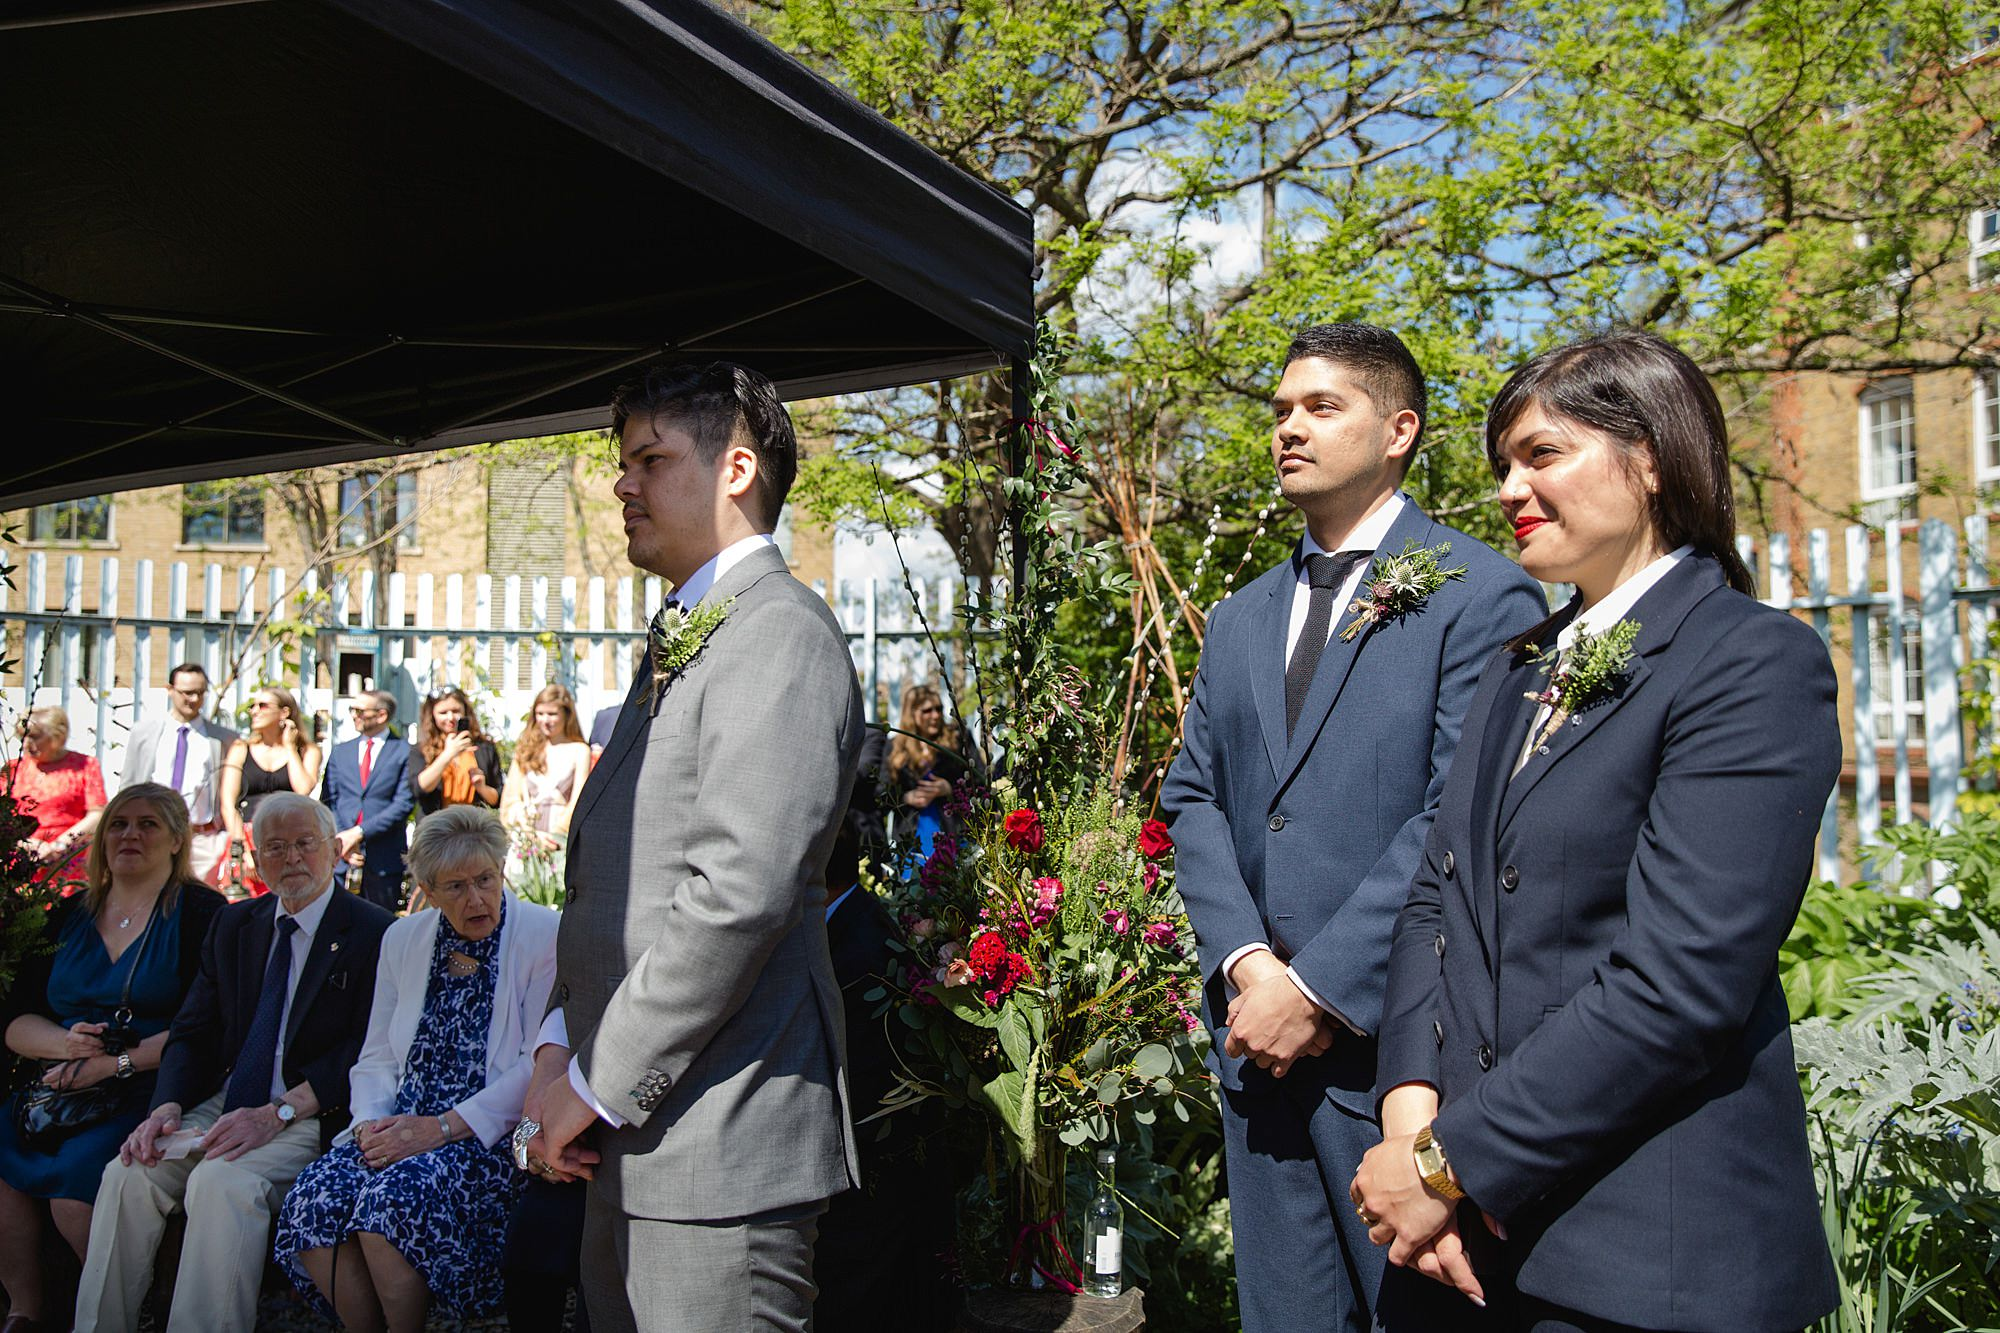 Brunel museum wedding groom waits for bride's entrance